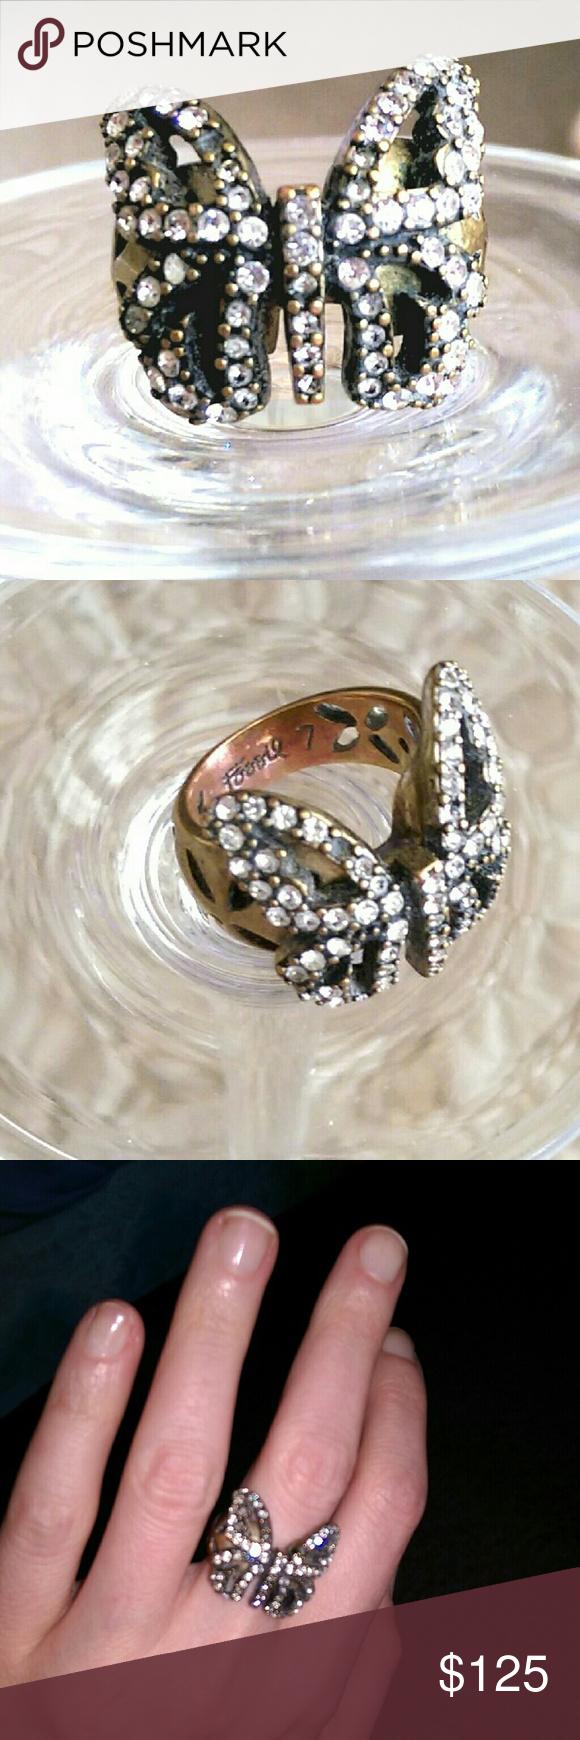 BDAY SALE {Fossil} signed vintage ring Vintage rings